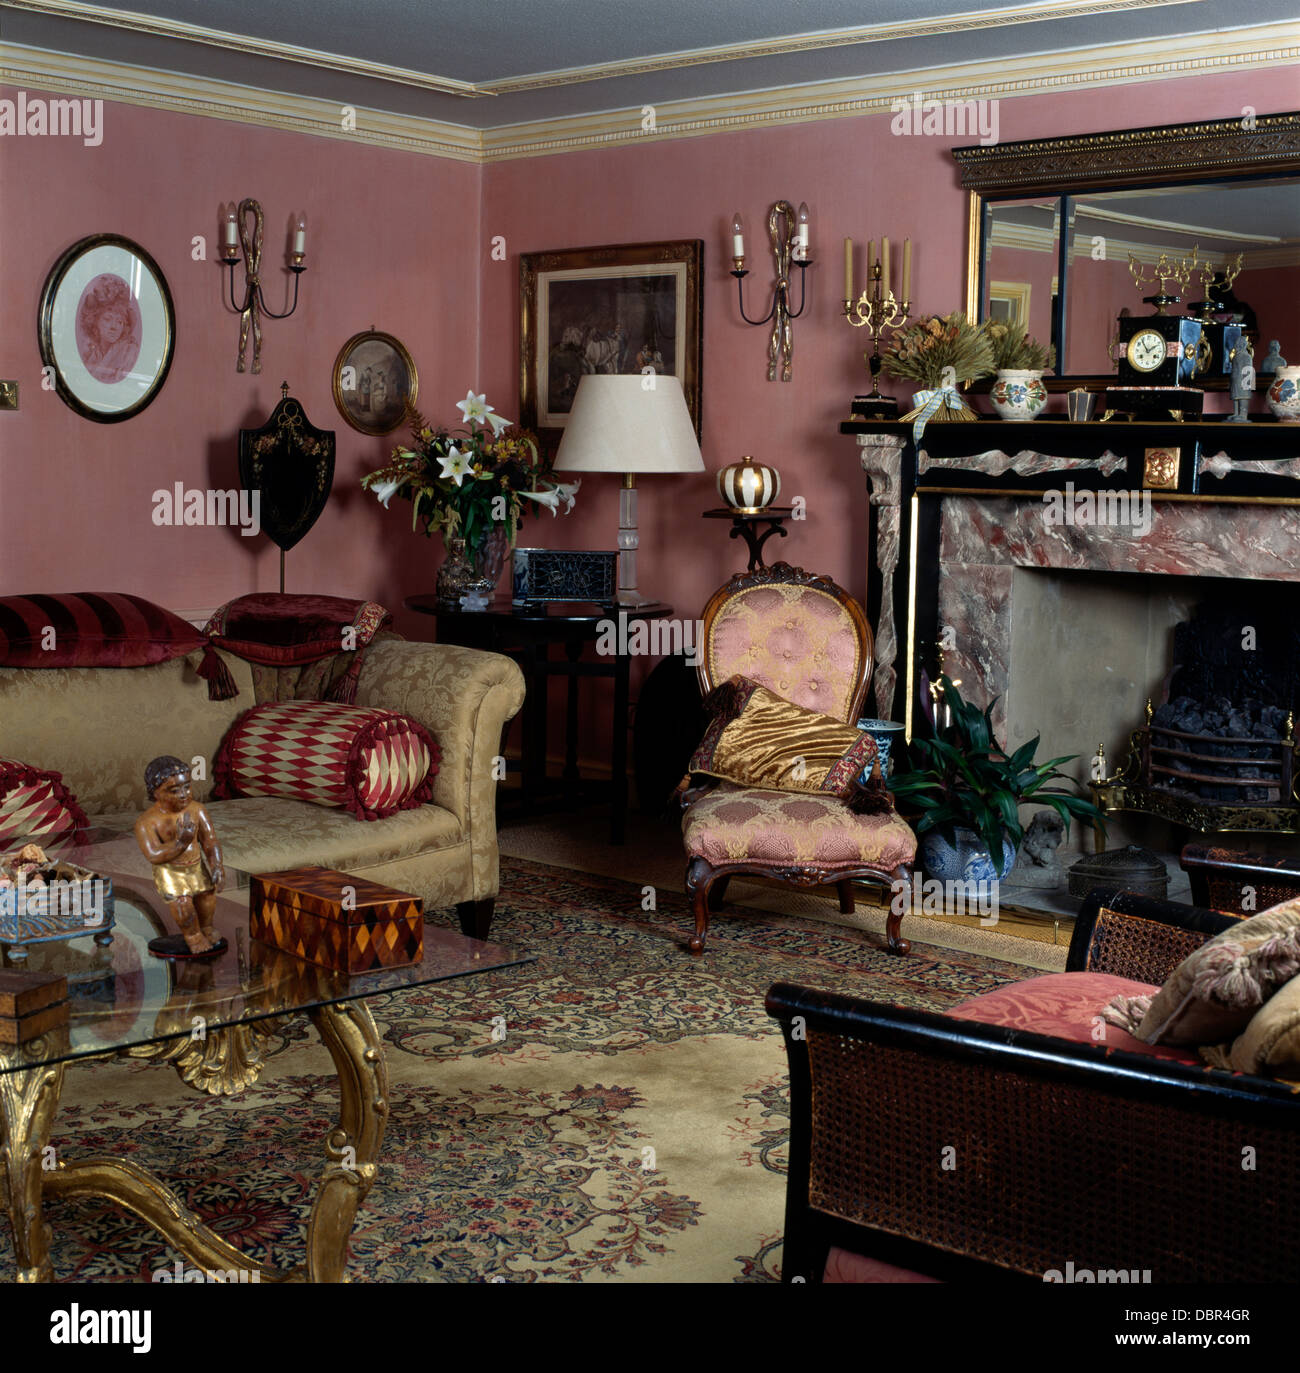 Interiors Living Rooms Fireplaces Carpets Stock Photos & Interiors ...